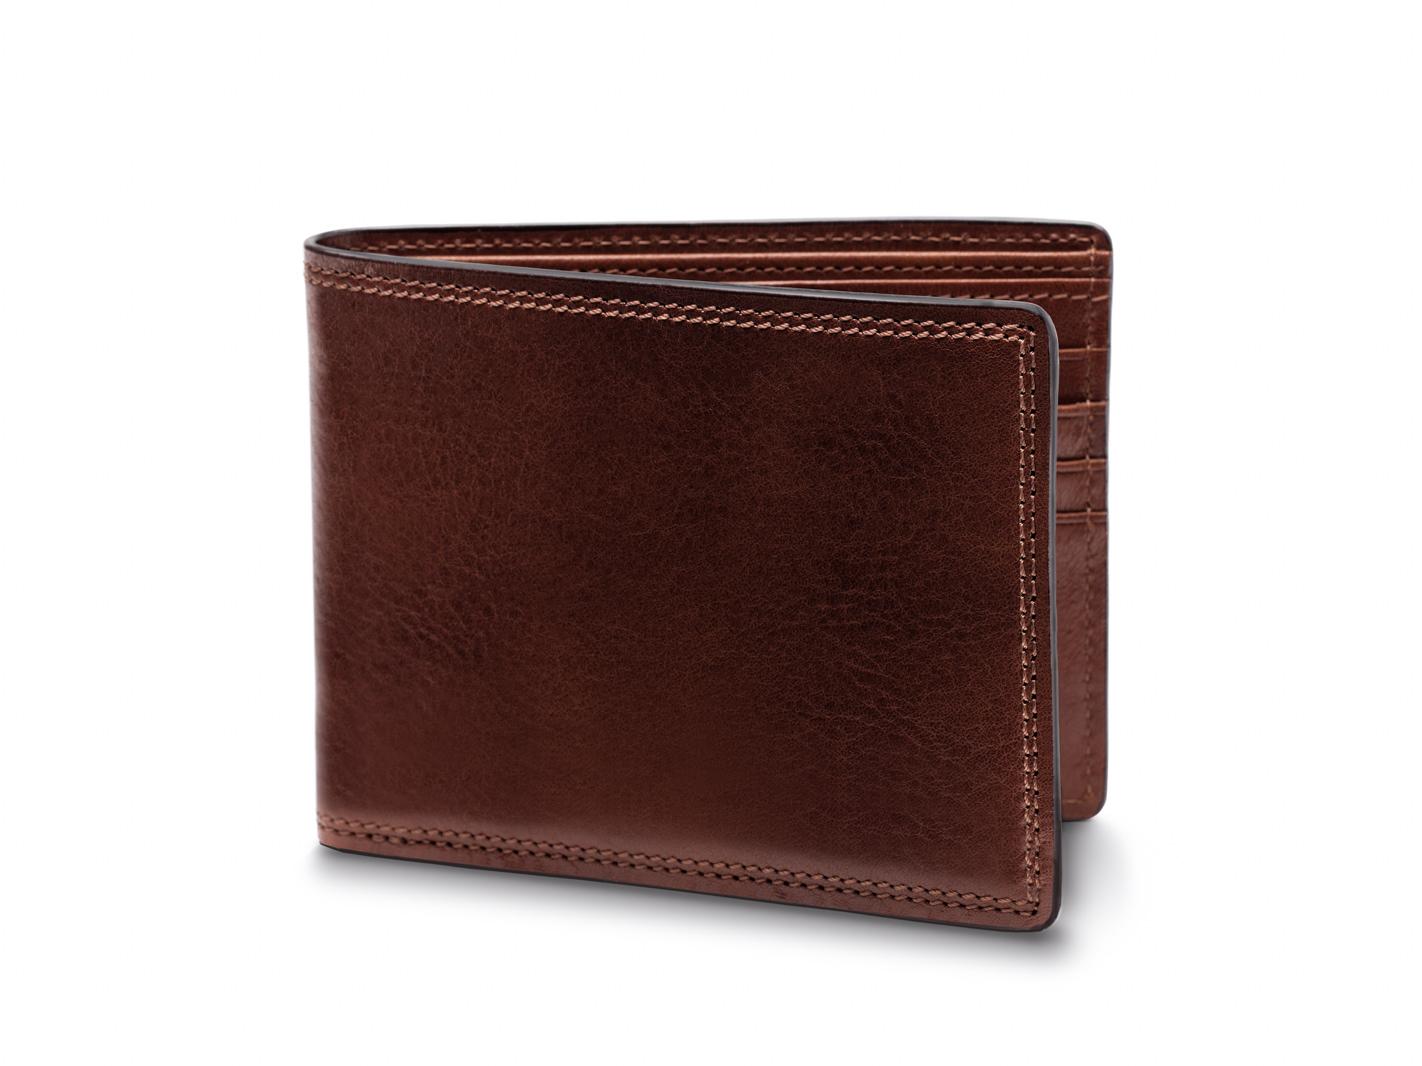 8 Pocket Deluxe Executive Wallet-218 Dark Brown - 218 Dark Brown